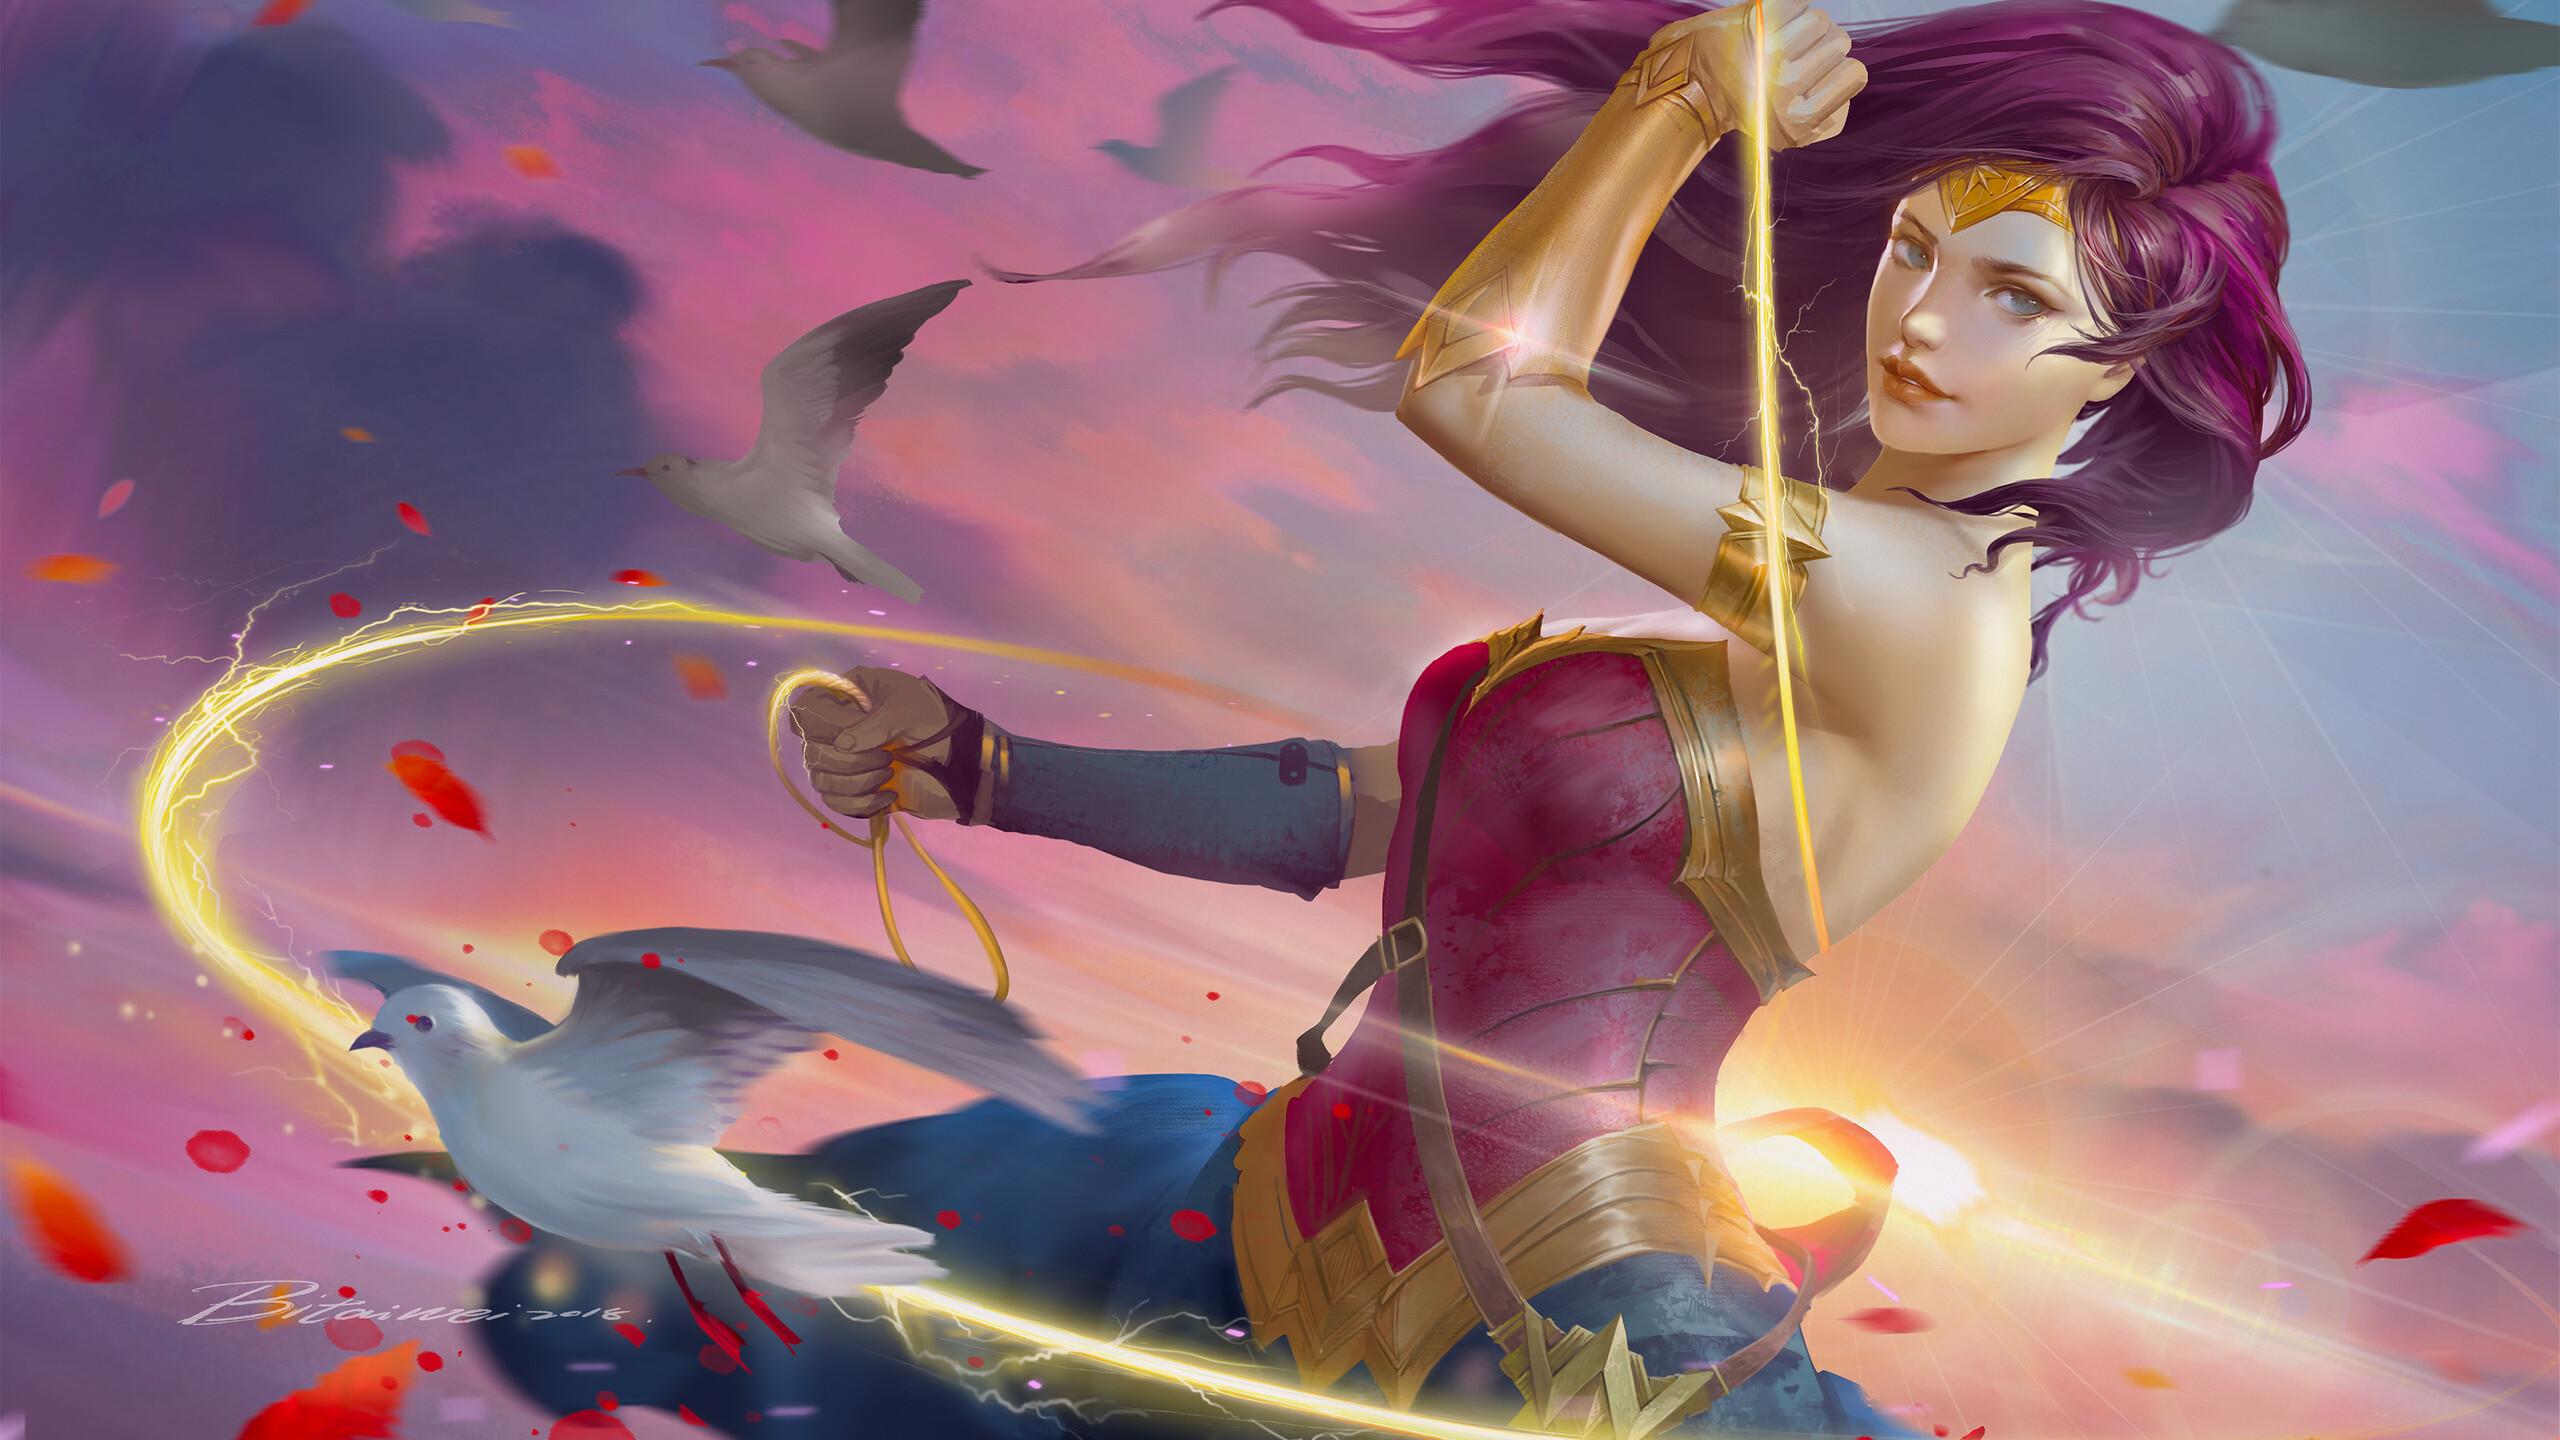 wonder-woman-colorful-art-4k-jj.jpg